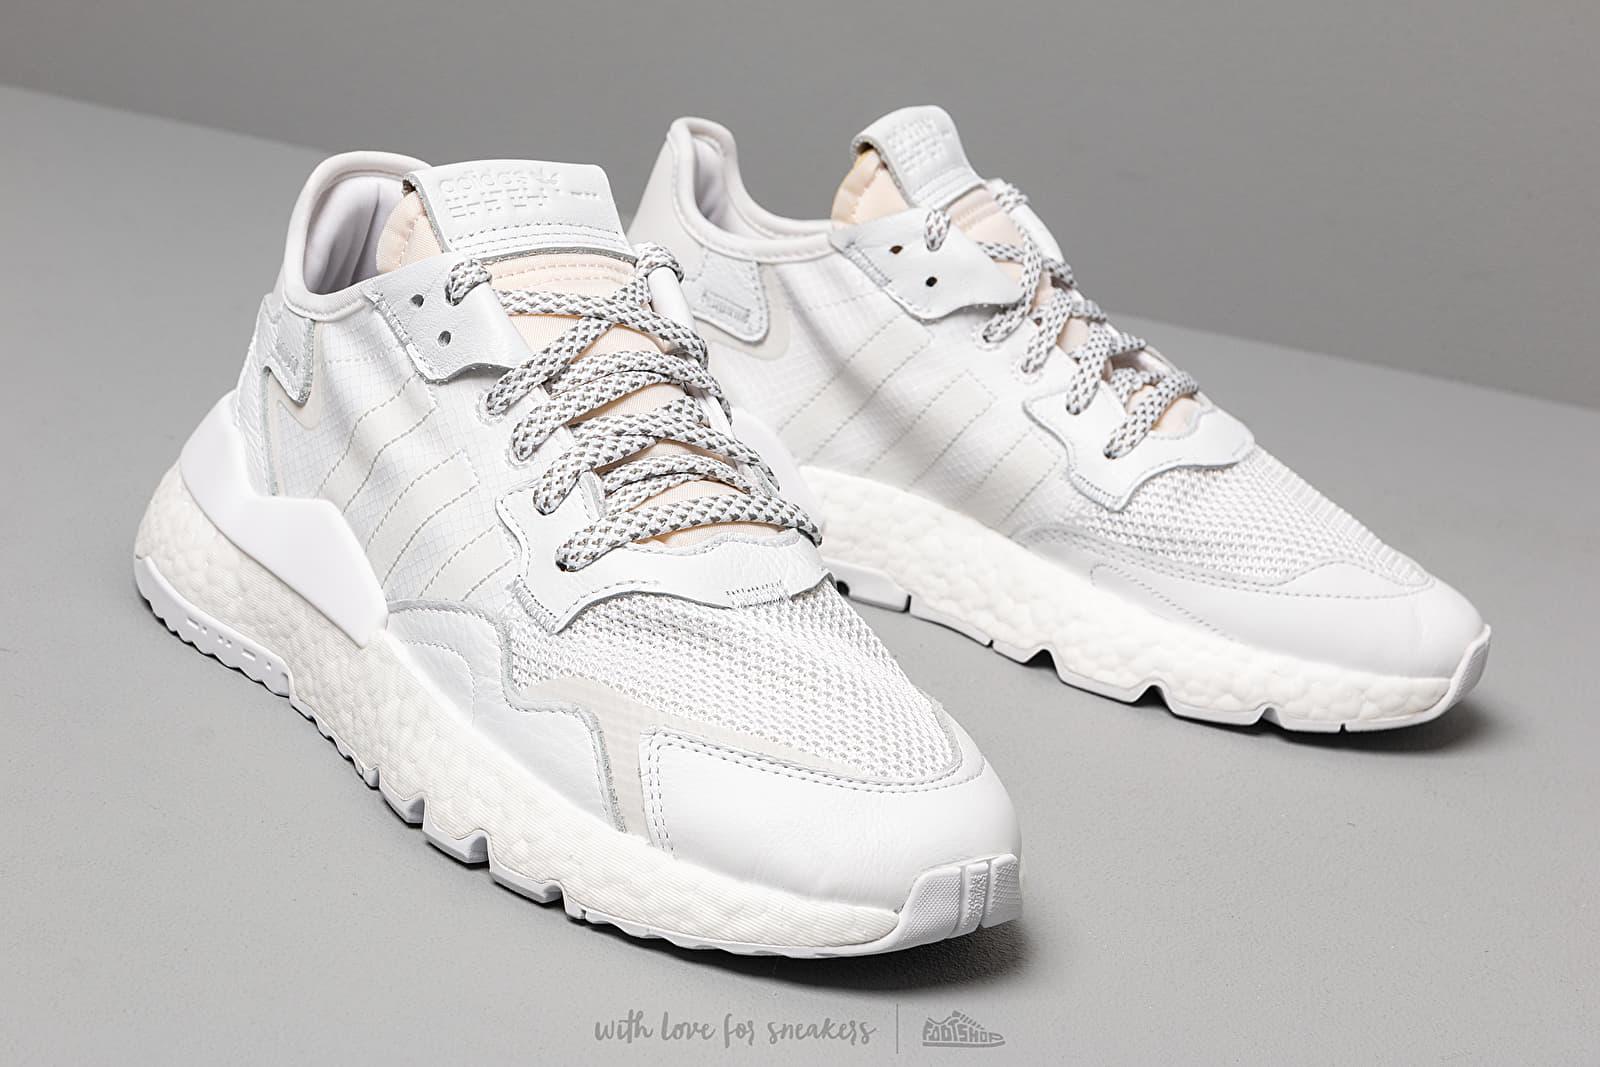 adidas Nite Jogger Ftw White Crystal White Crystal White | Footshop